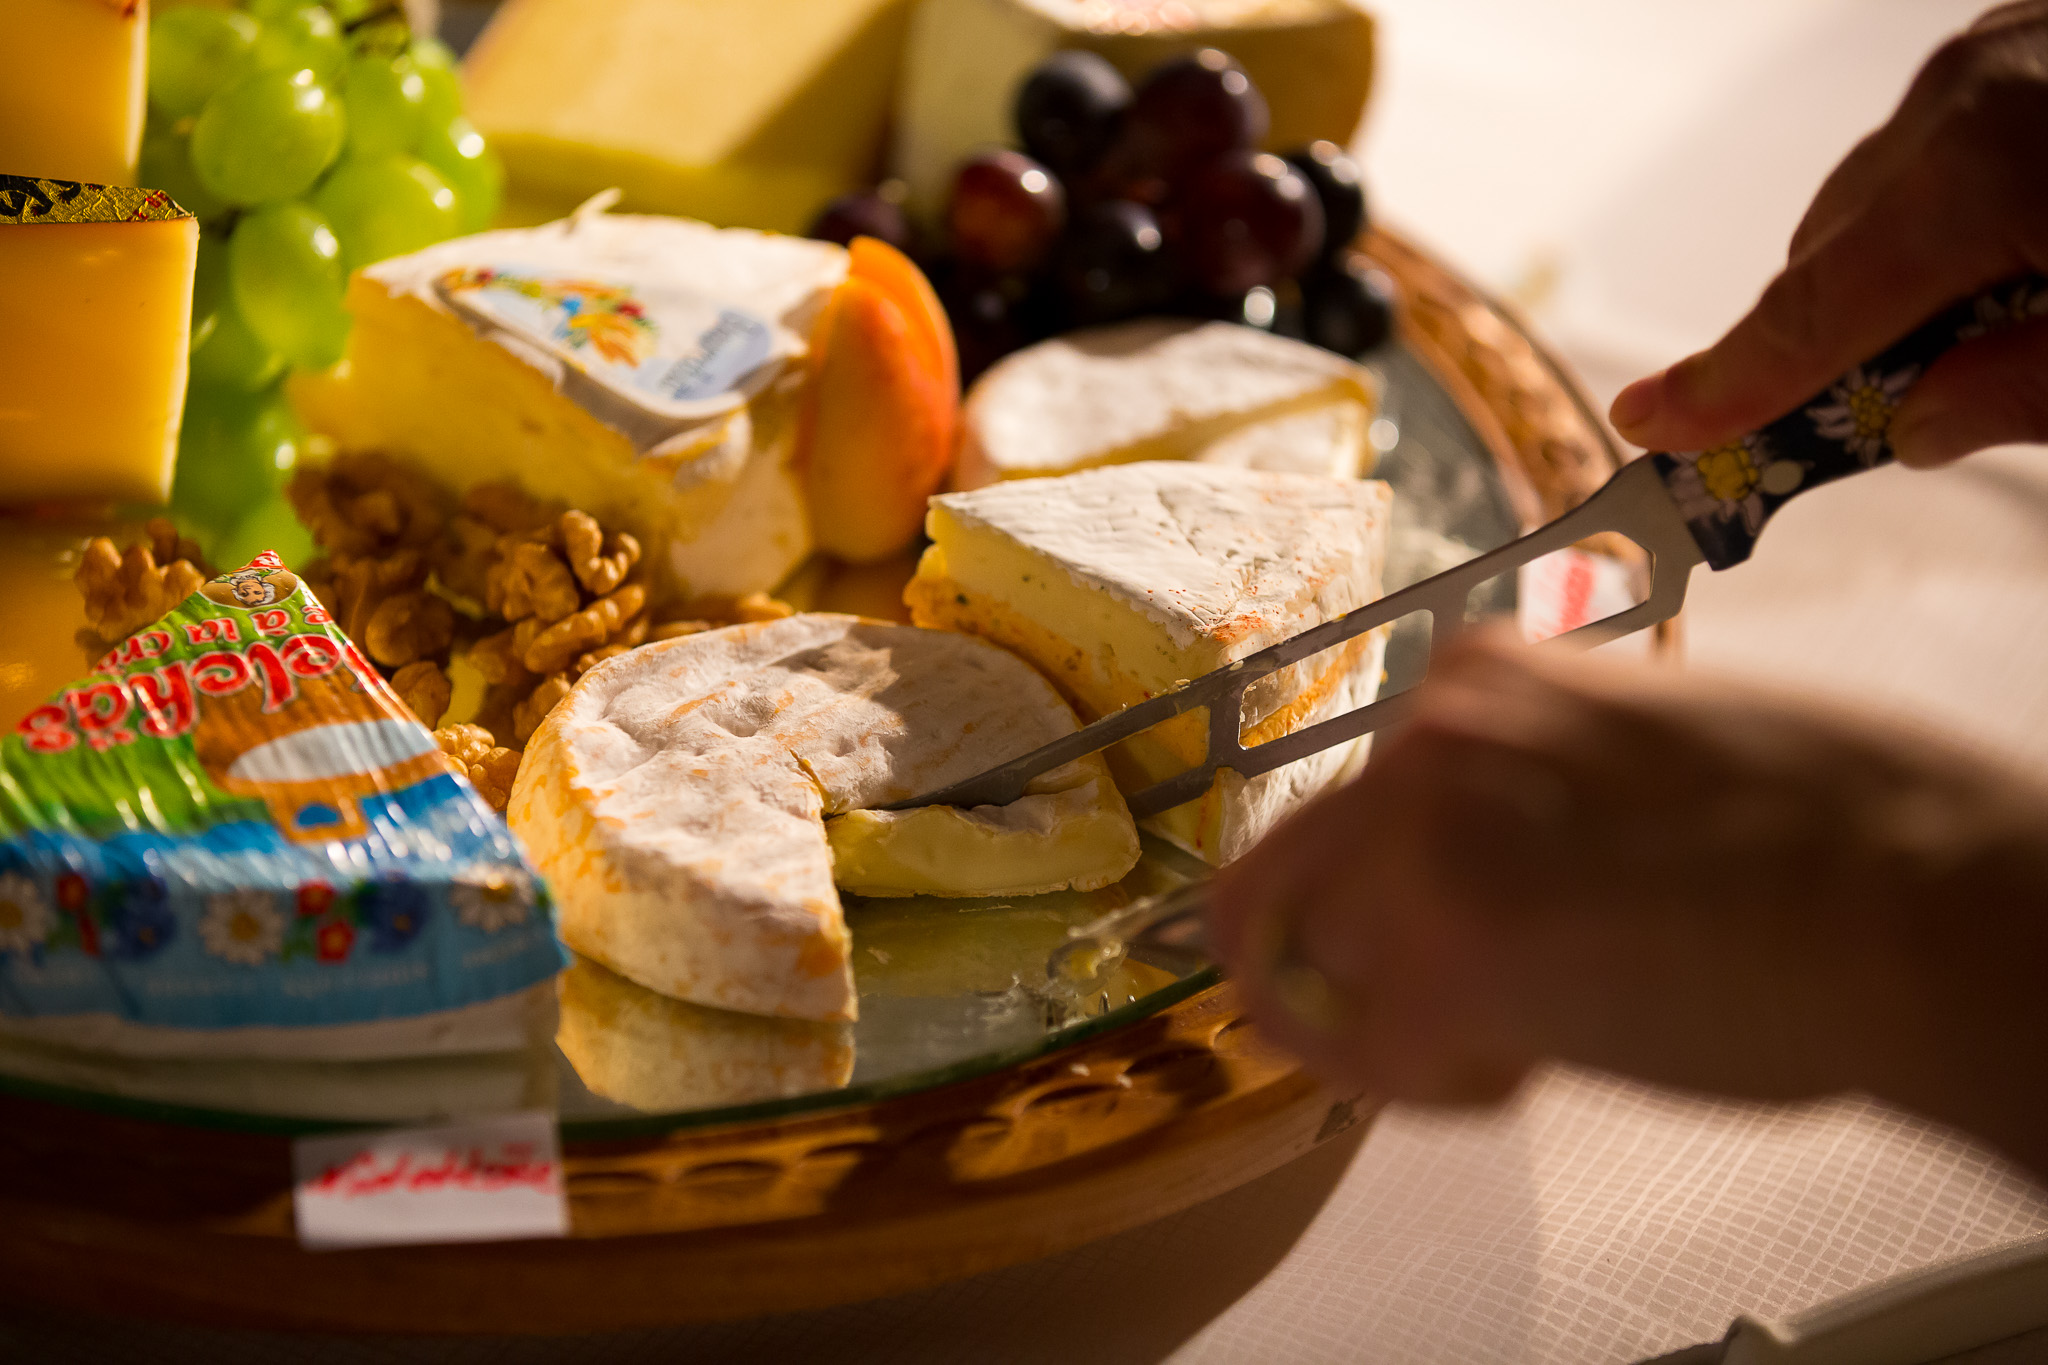 käse, apéro auf dem römerhof in bühl